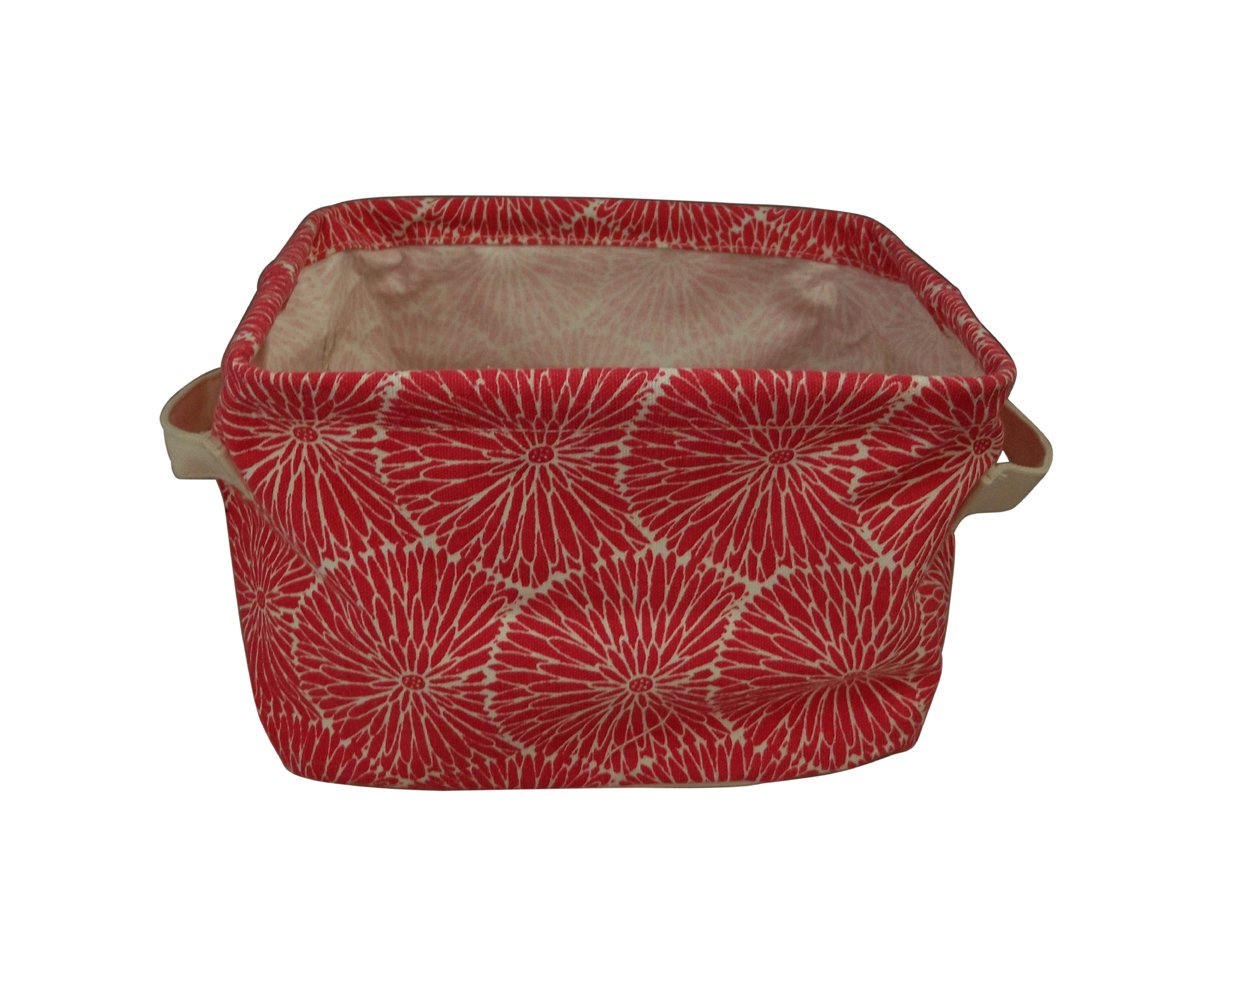 Cool Amazon Com Gisela Graham Pink Gerbera Fabric Storage Basket Short Links Chair Design For Home Short Linksinfo